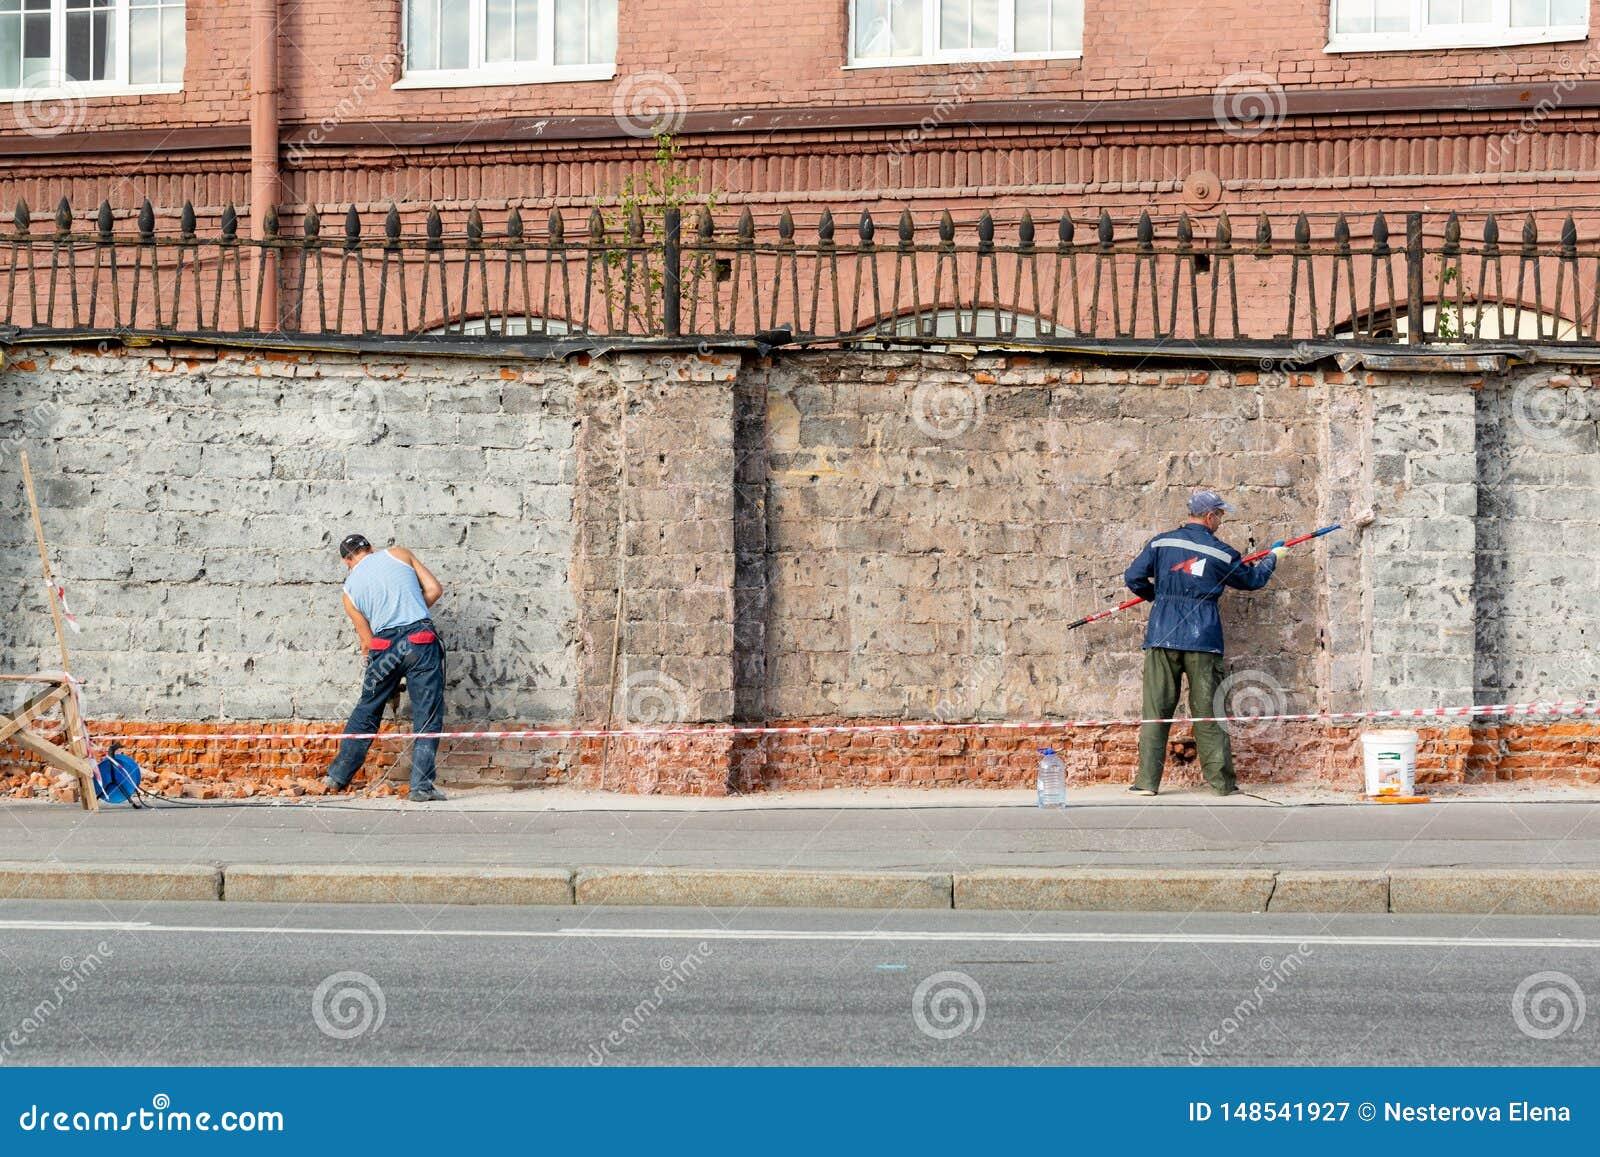 Saint Petersburg, Russian Federation-Aug 16 2018: workers repairing a brick fence